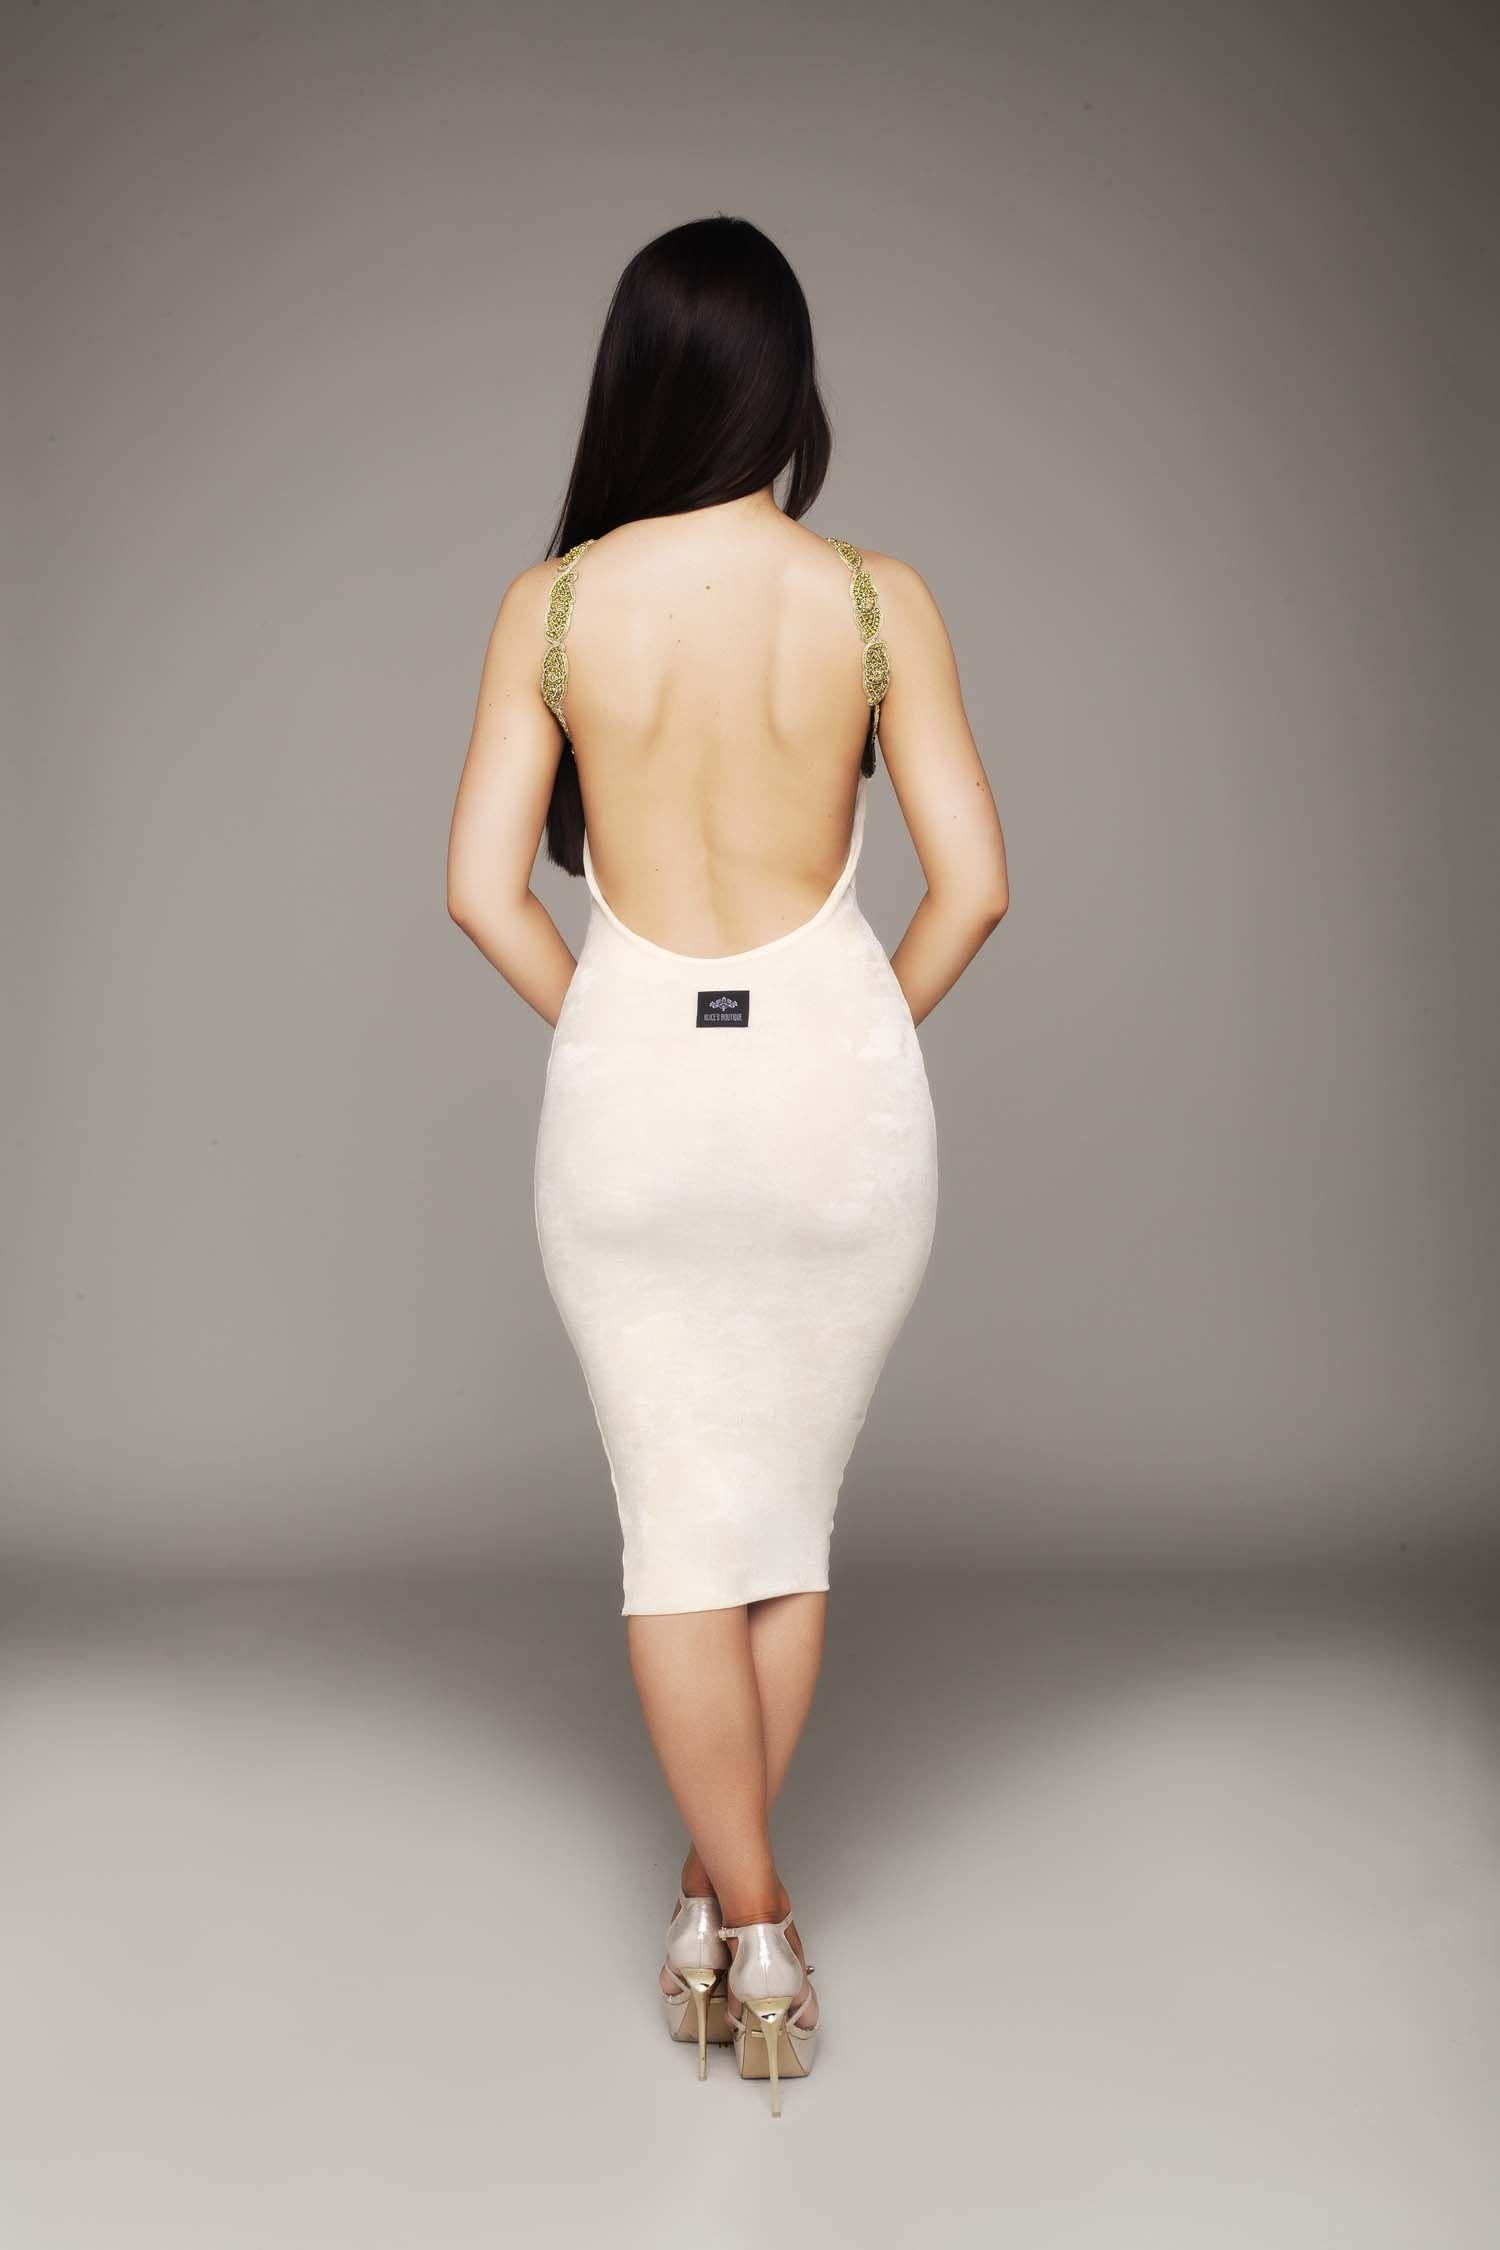 Black Backless Dress with Embellished Straps   Dresses   Miss Foxy ...